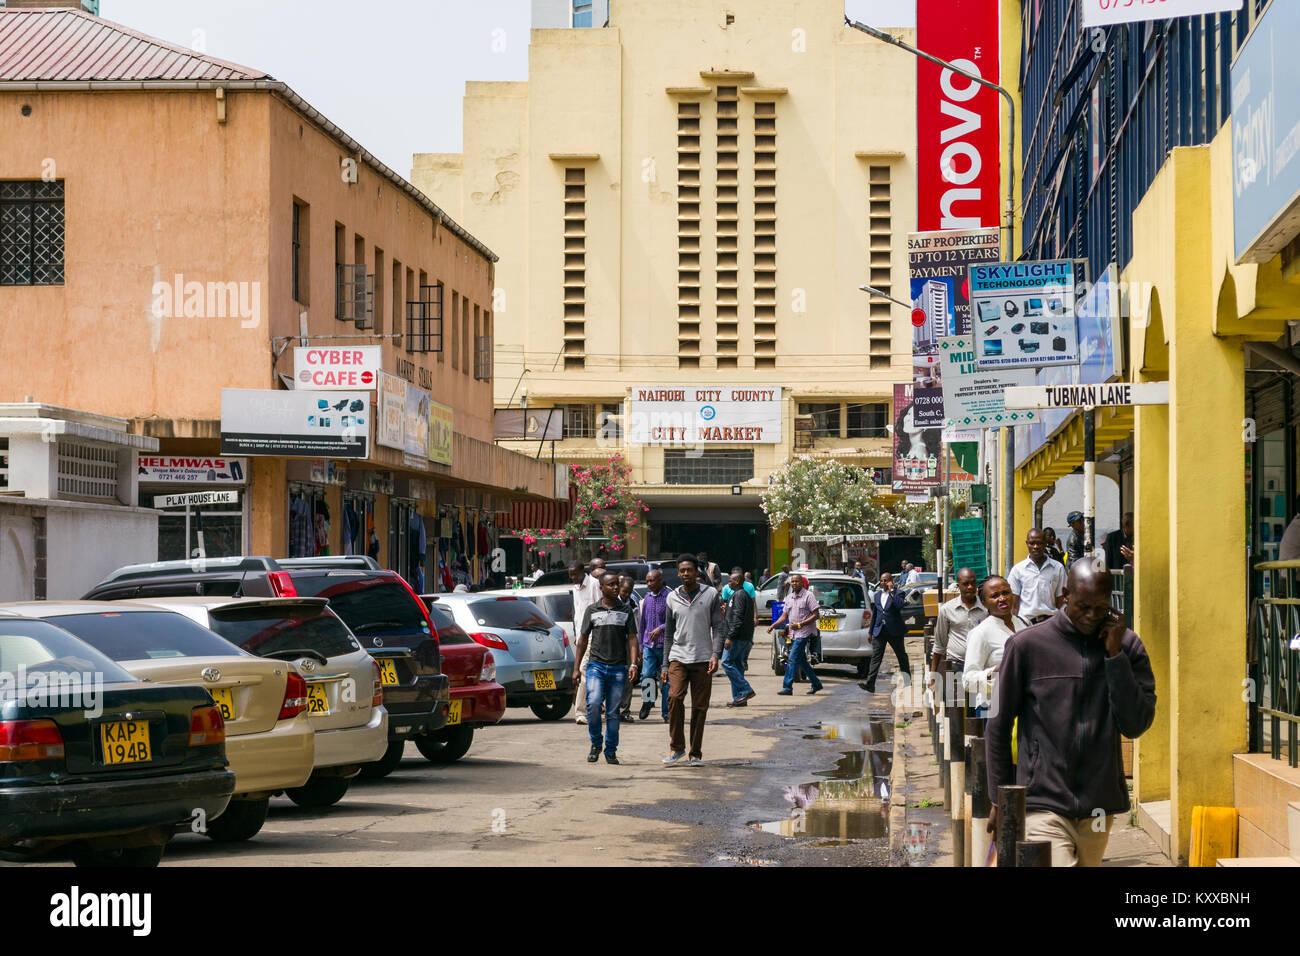 Kigali City Street Map on taipei city street map, denver city street map, kiev city street map, anchorage city street map, munich city street map, cape town city street map, kathmandu city street map, harare city street map, phoenix city street map, london city street map, atlanta city street map, paris city street map, jerusalem city street map, houston city street map, dayton city street map, chicago city street map, dallas city street map, toronto city street map, sydney city street map, djibouti city street map,